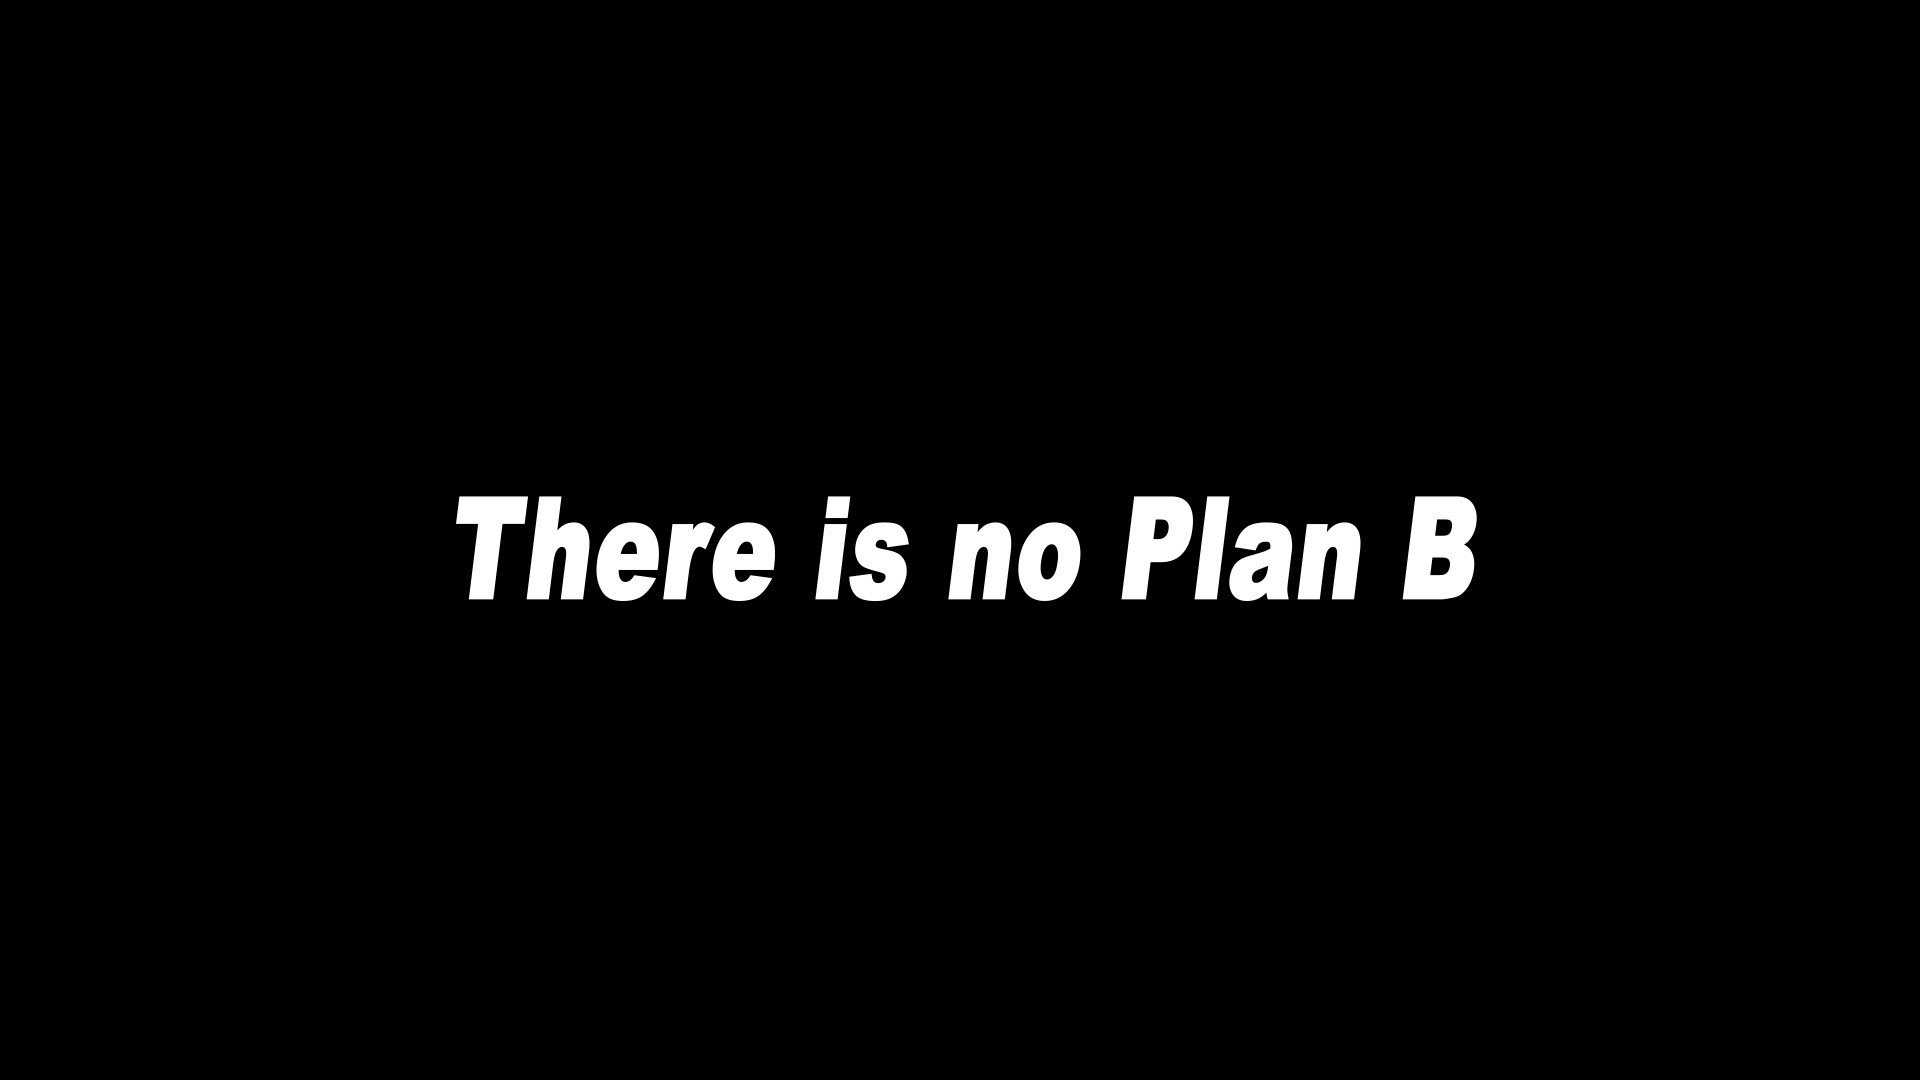 Plan B – Wallpaper ID: 552045497